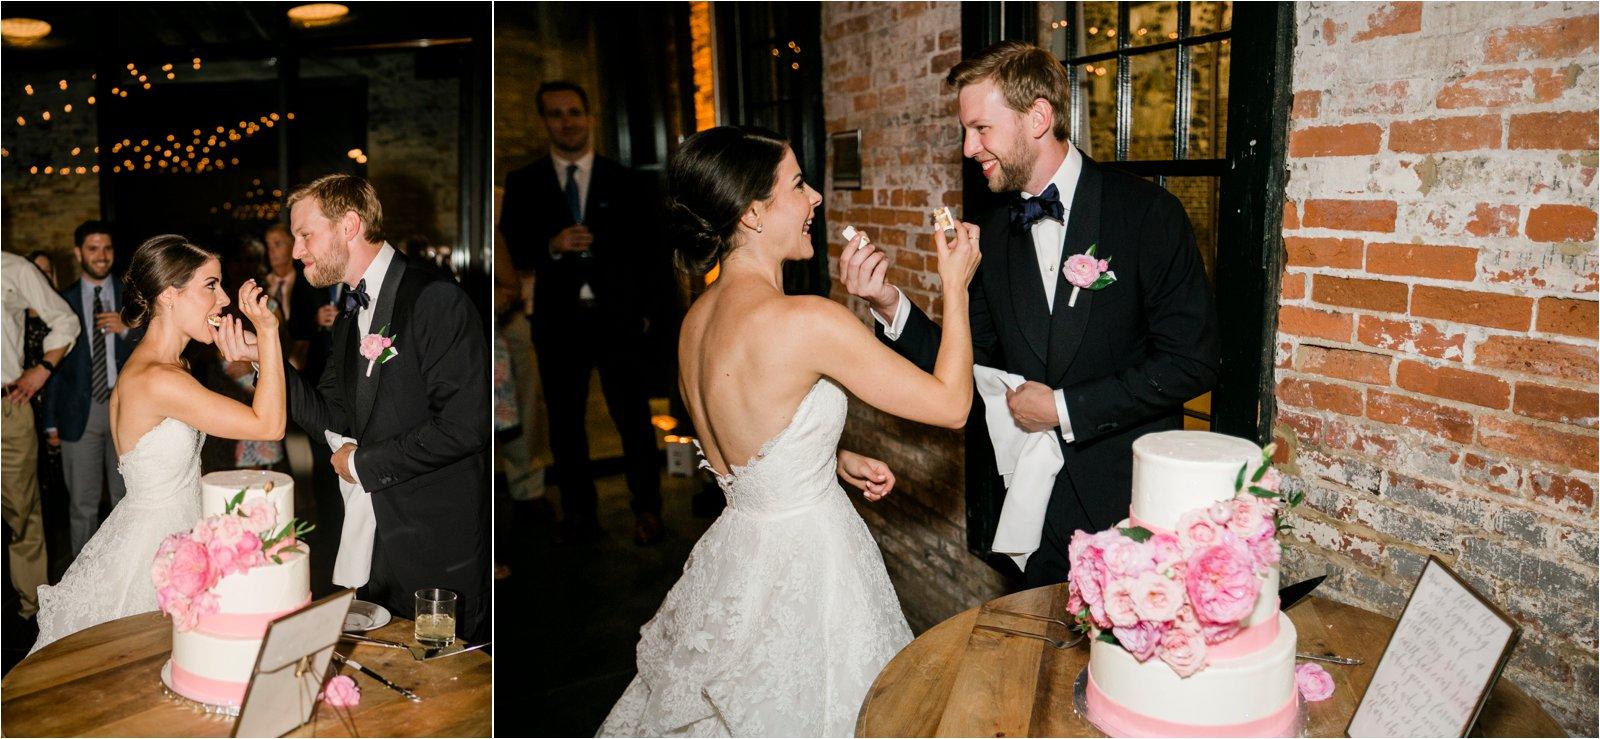 Baltimore Wedding Photographer_127.jpg